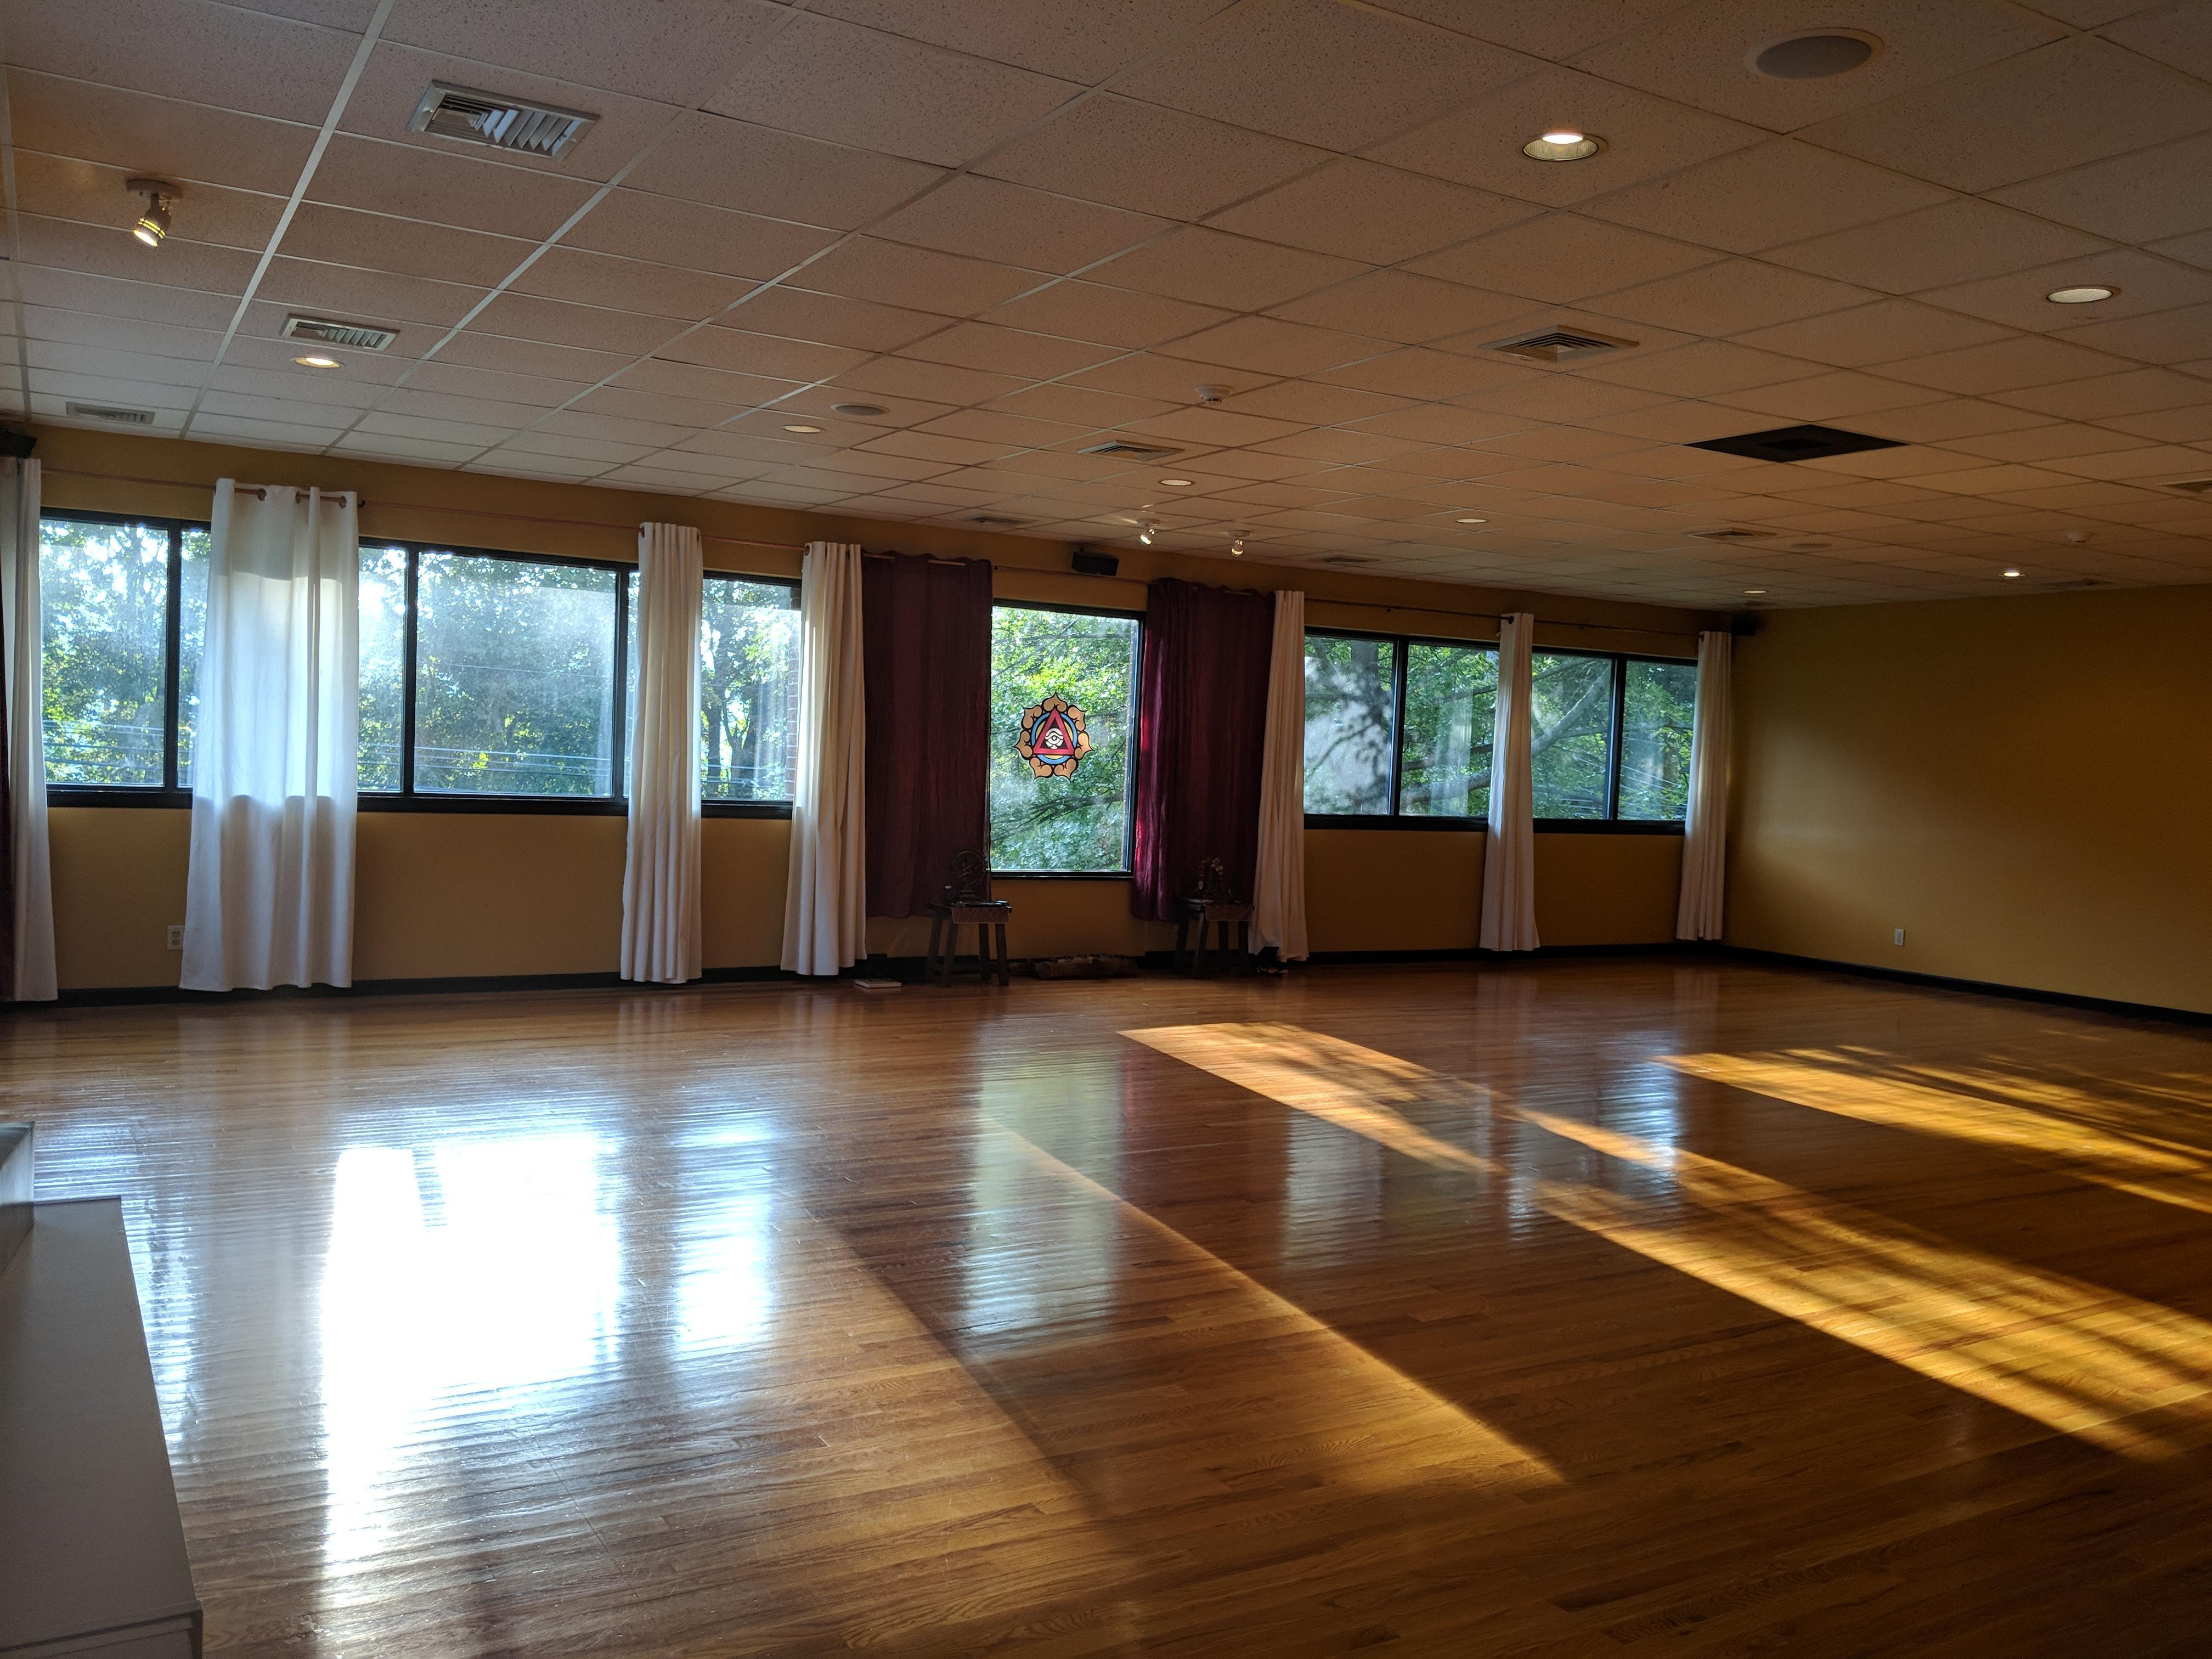 Liberation Yoga & Wellness Center image 6